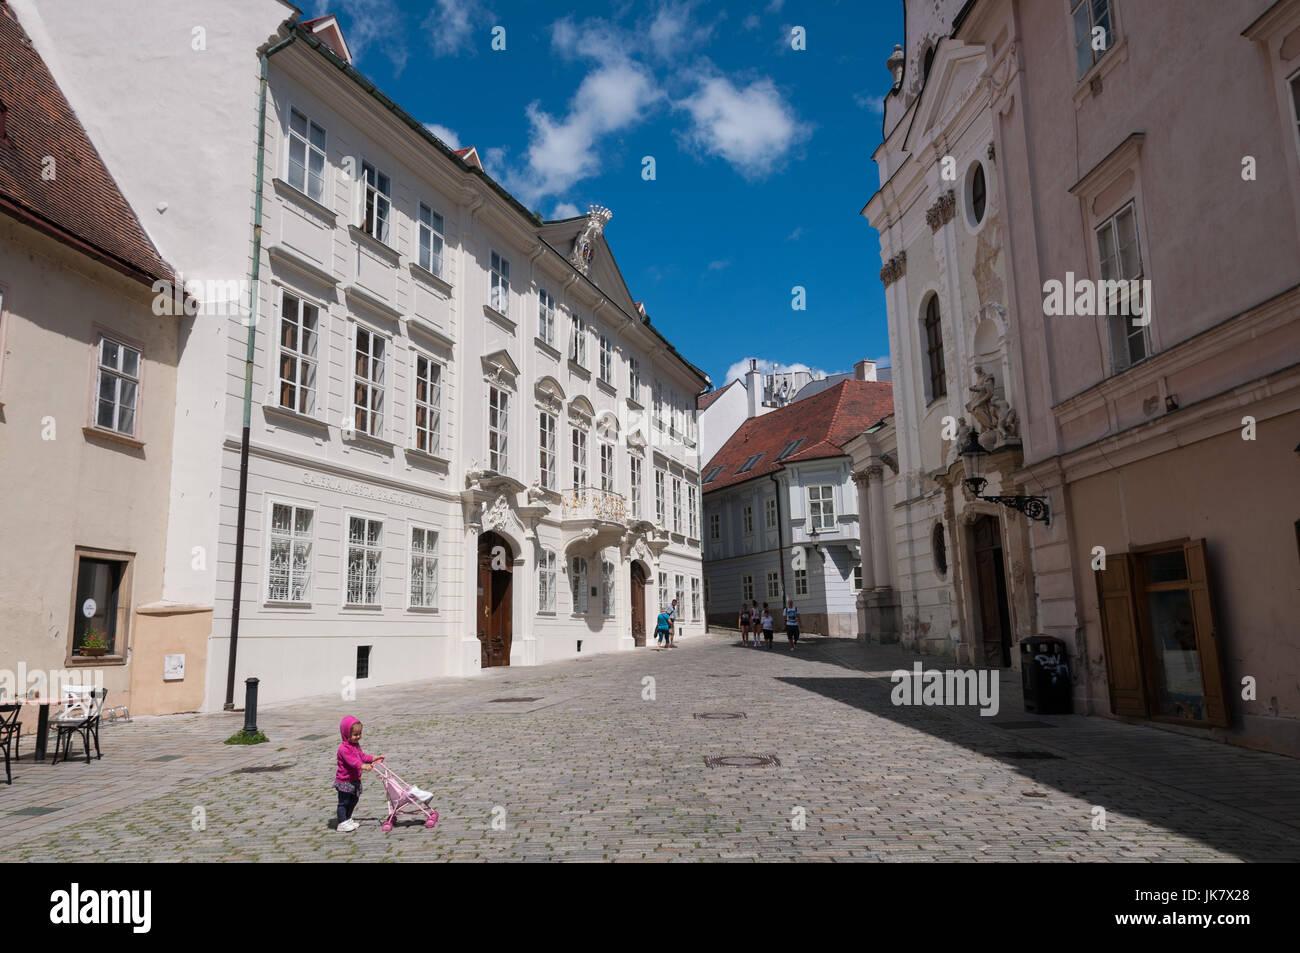 Mirbach Palace (Bratislava City Gallery) on the left, Franciscan Church on the right, Bratislava Slovakia - Stock Image